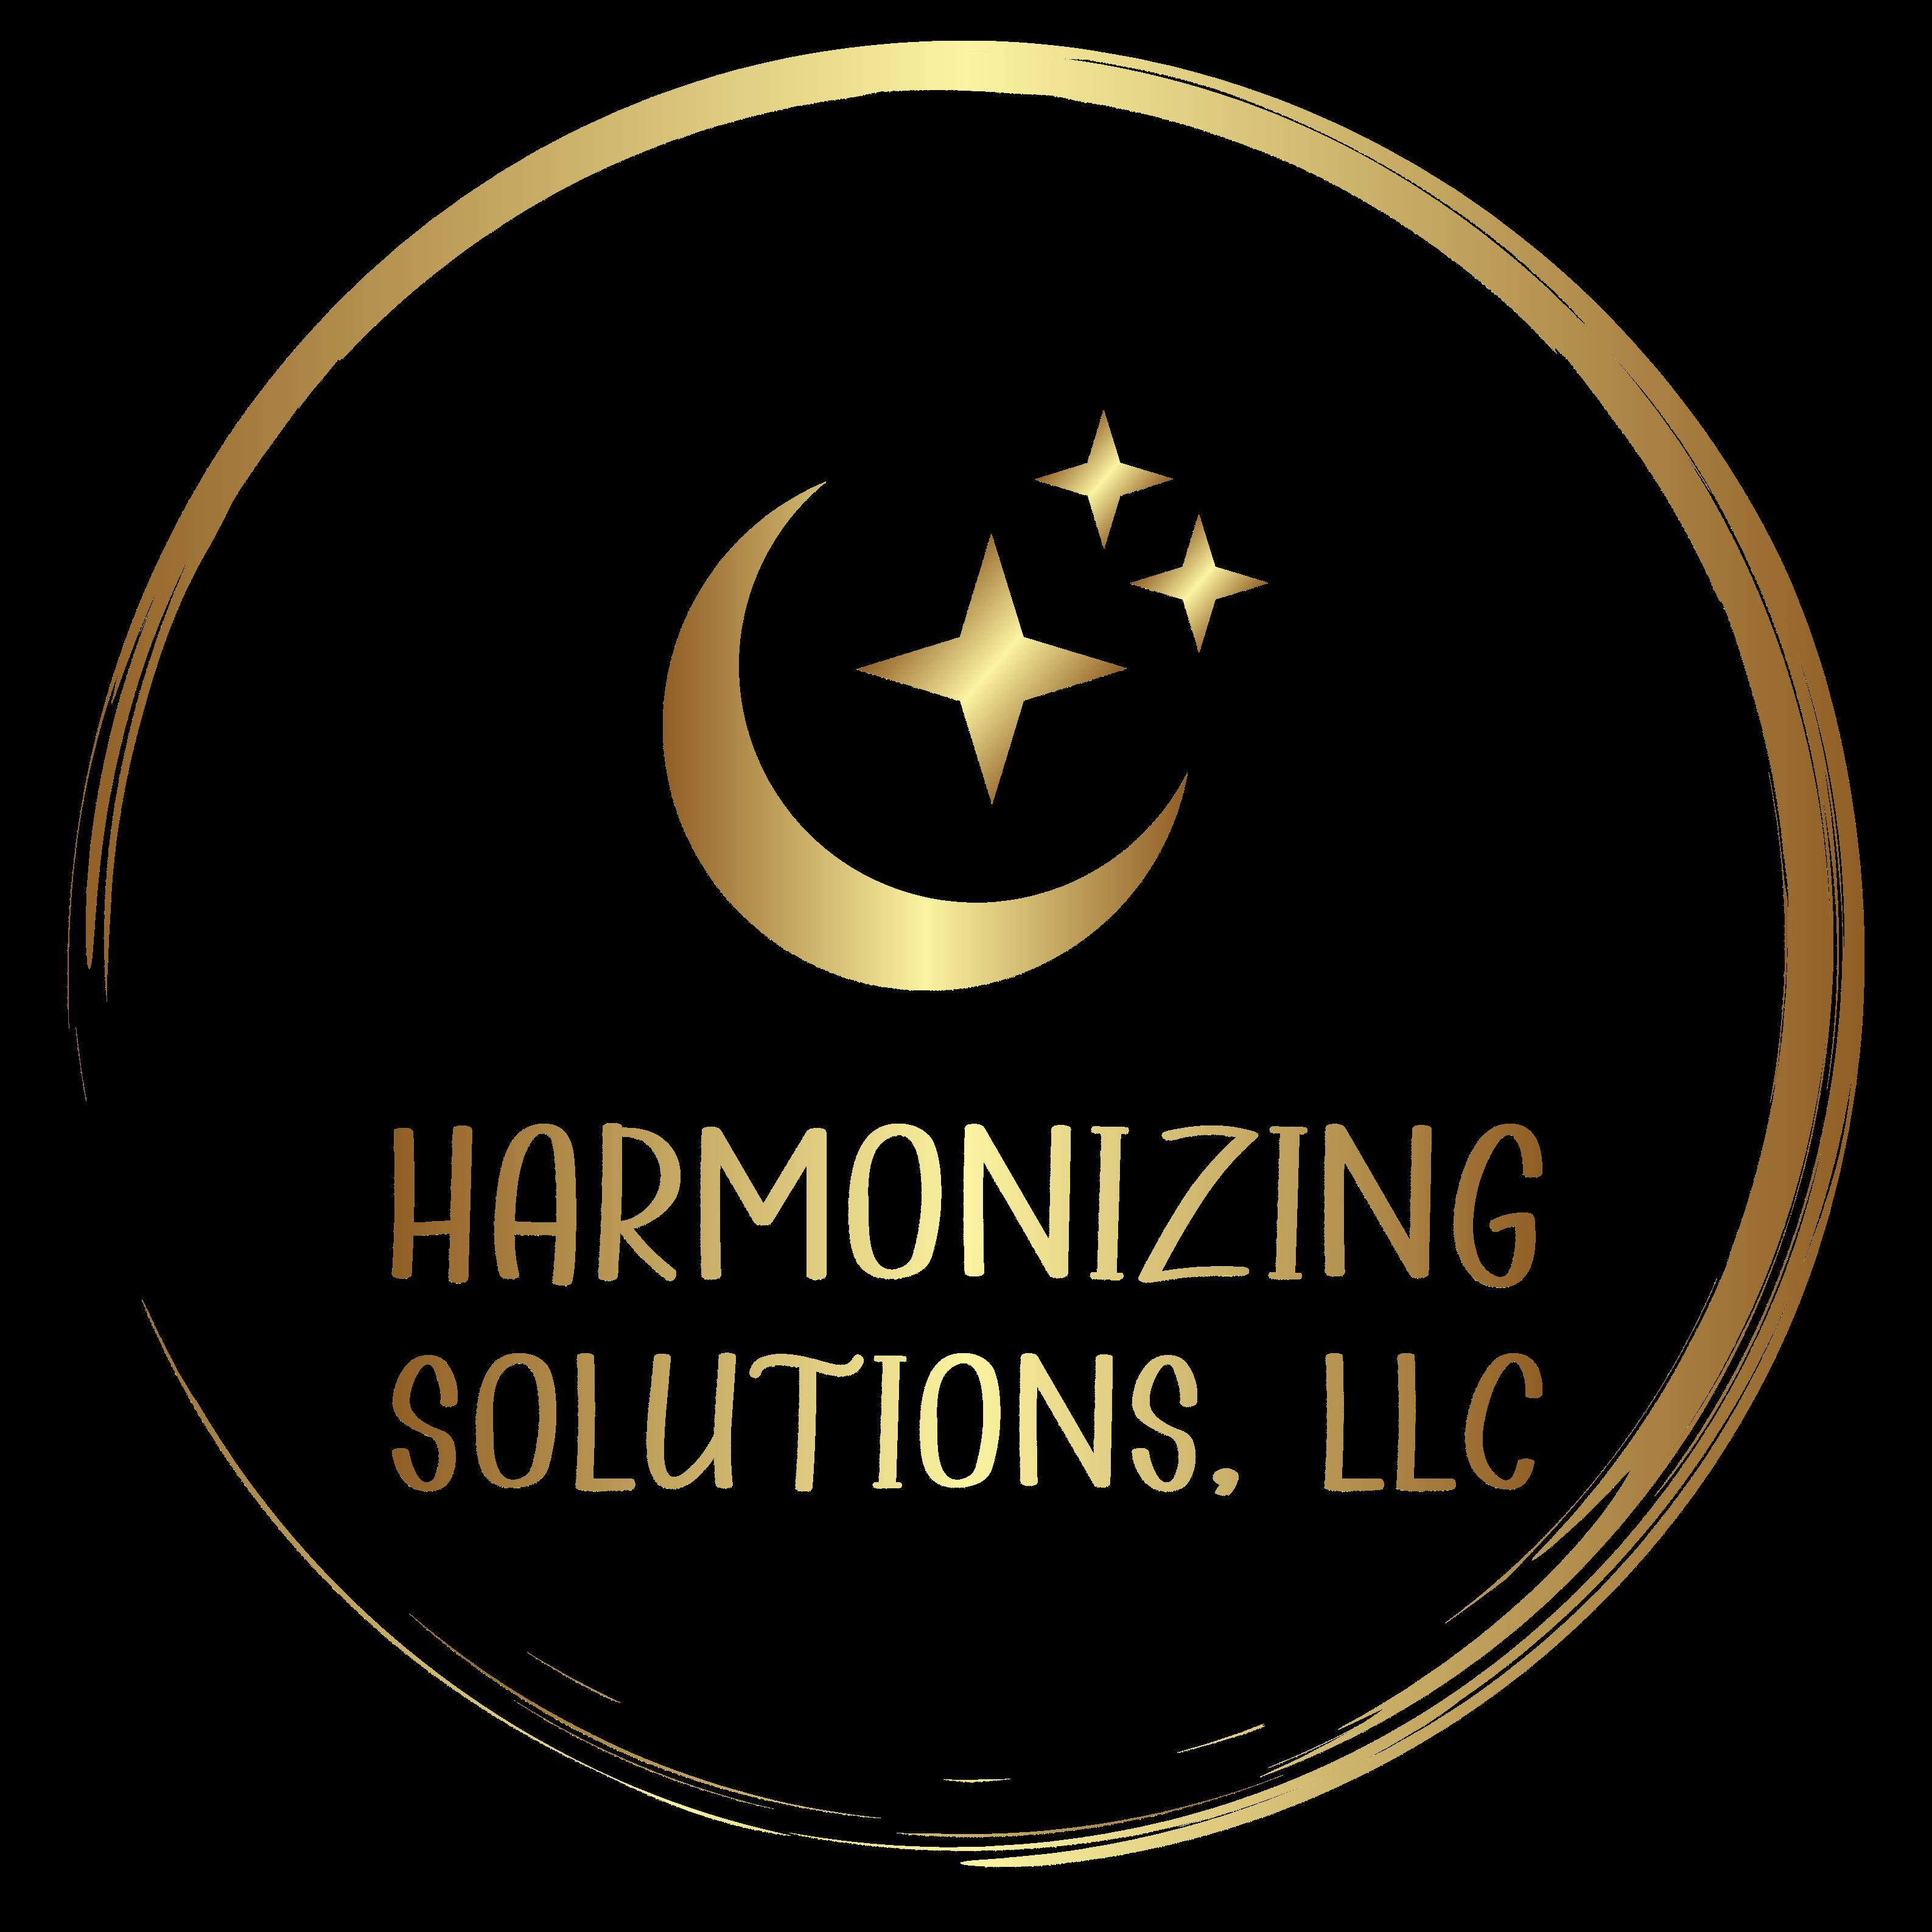 Harmonizing Solutions, LLC